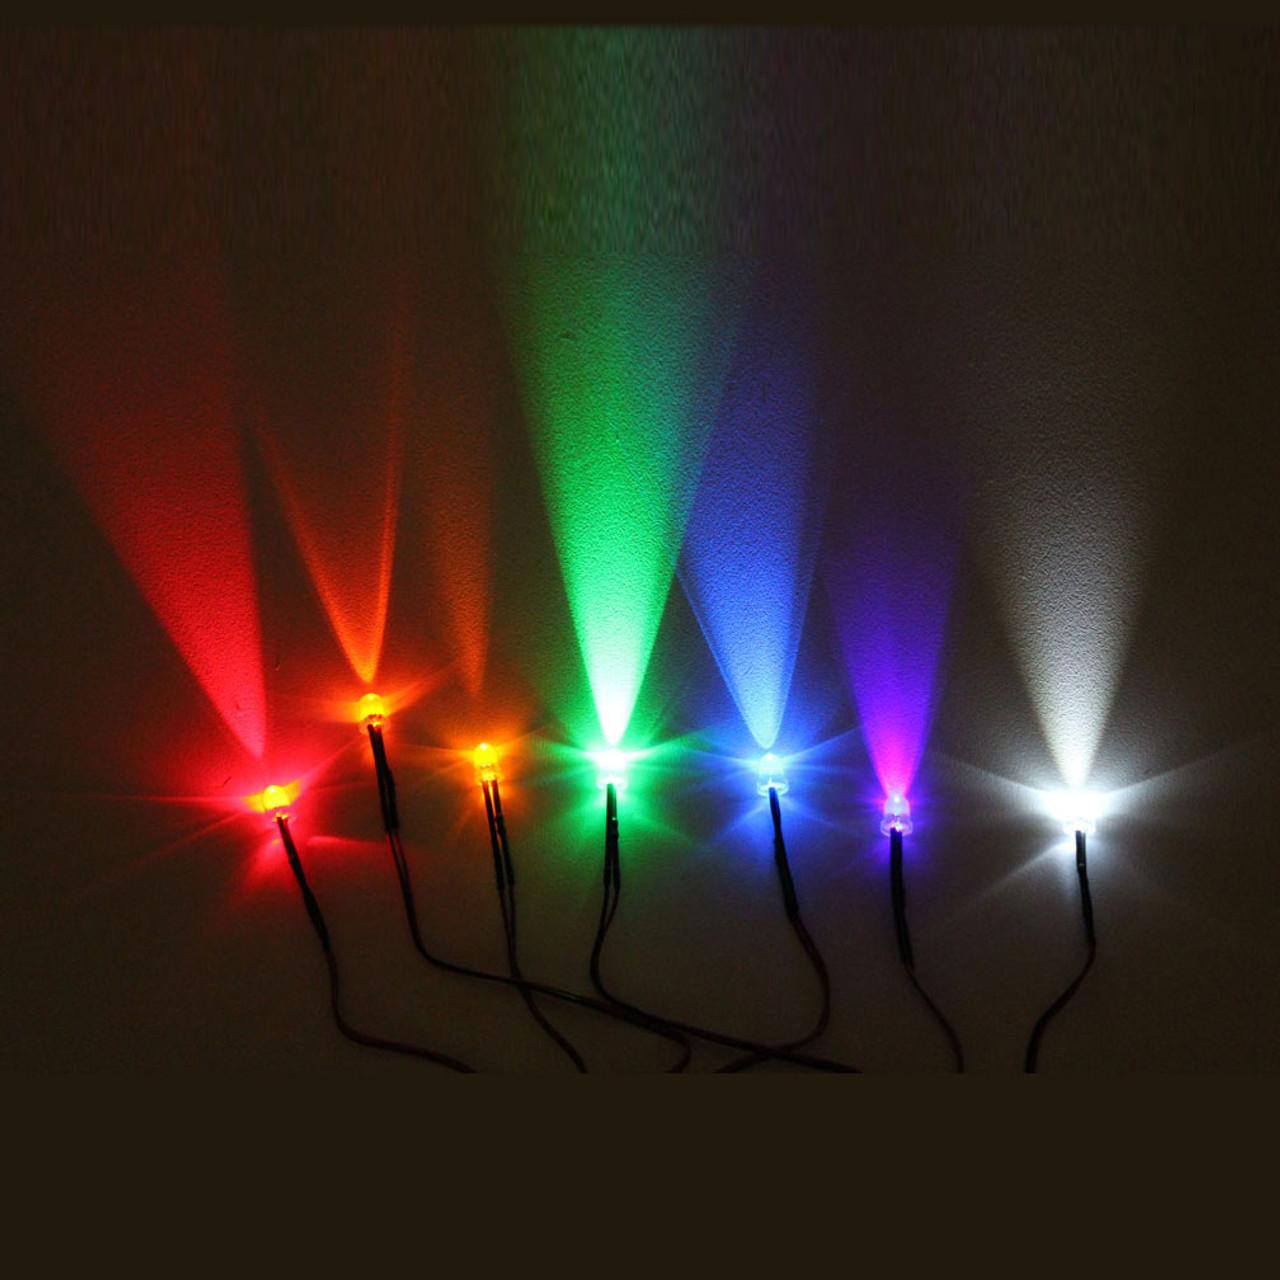 Sensational 5Mm Round Led Lights With 55Cm Wire 12V 10 Pack Genssi Wiring Digital Resources Funapmognl